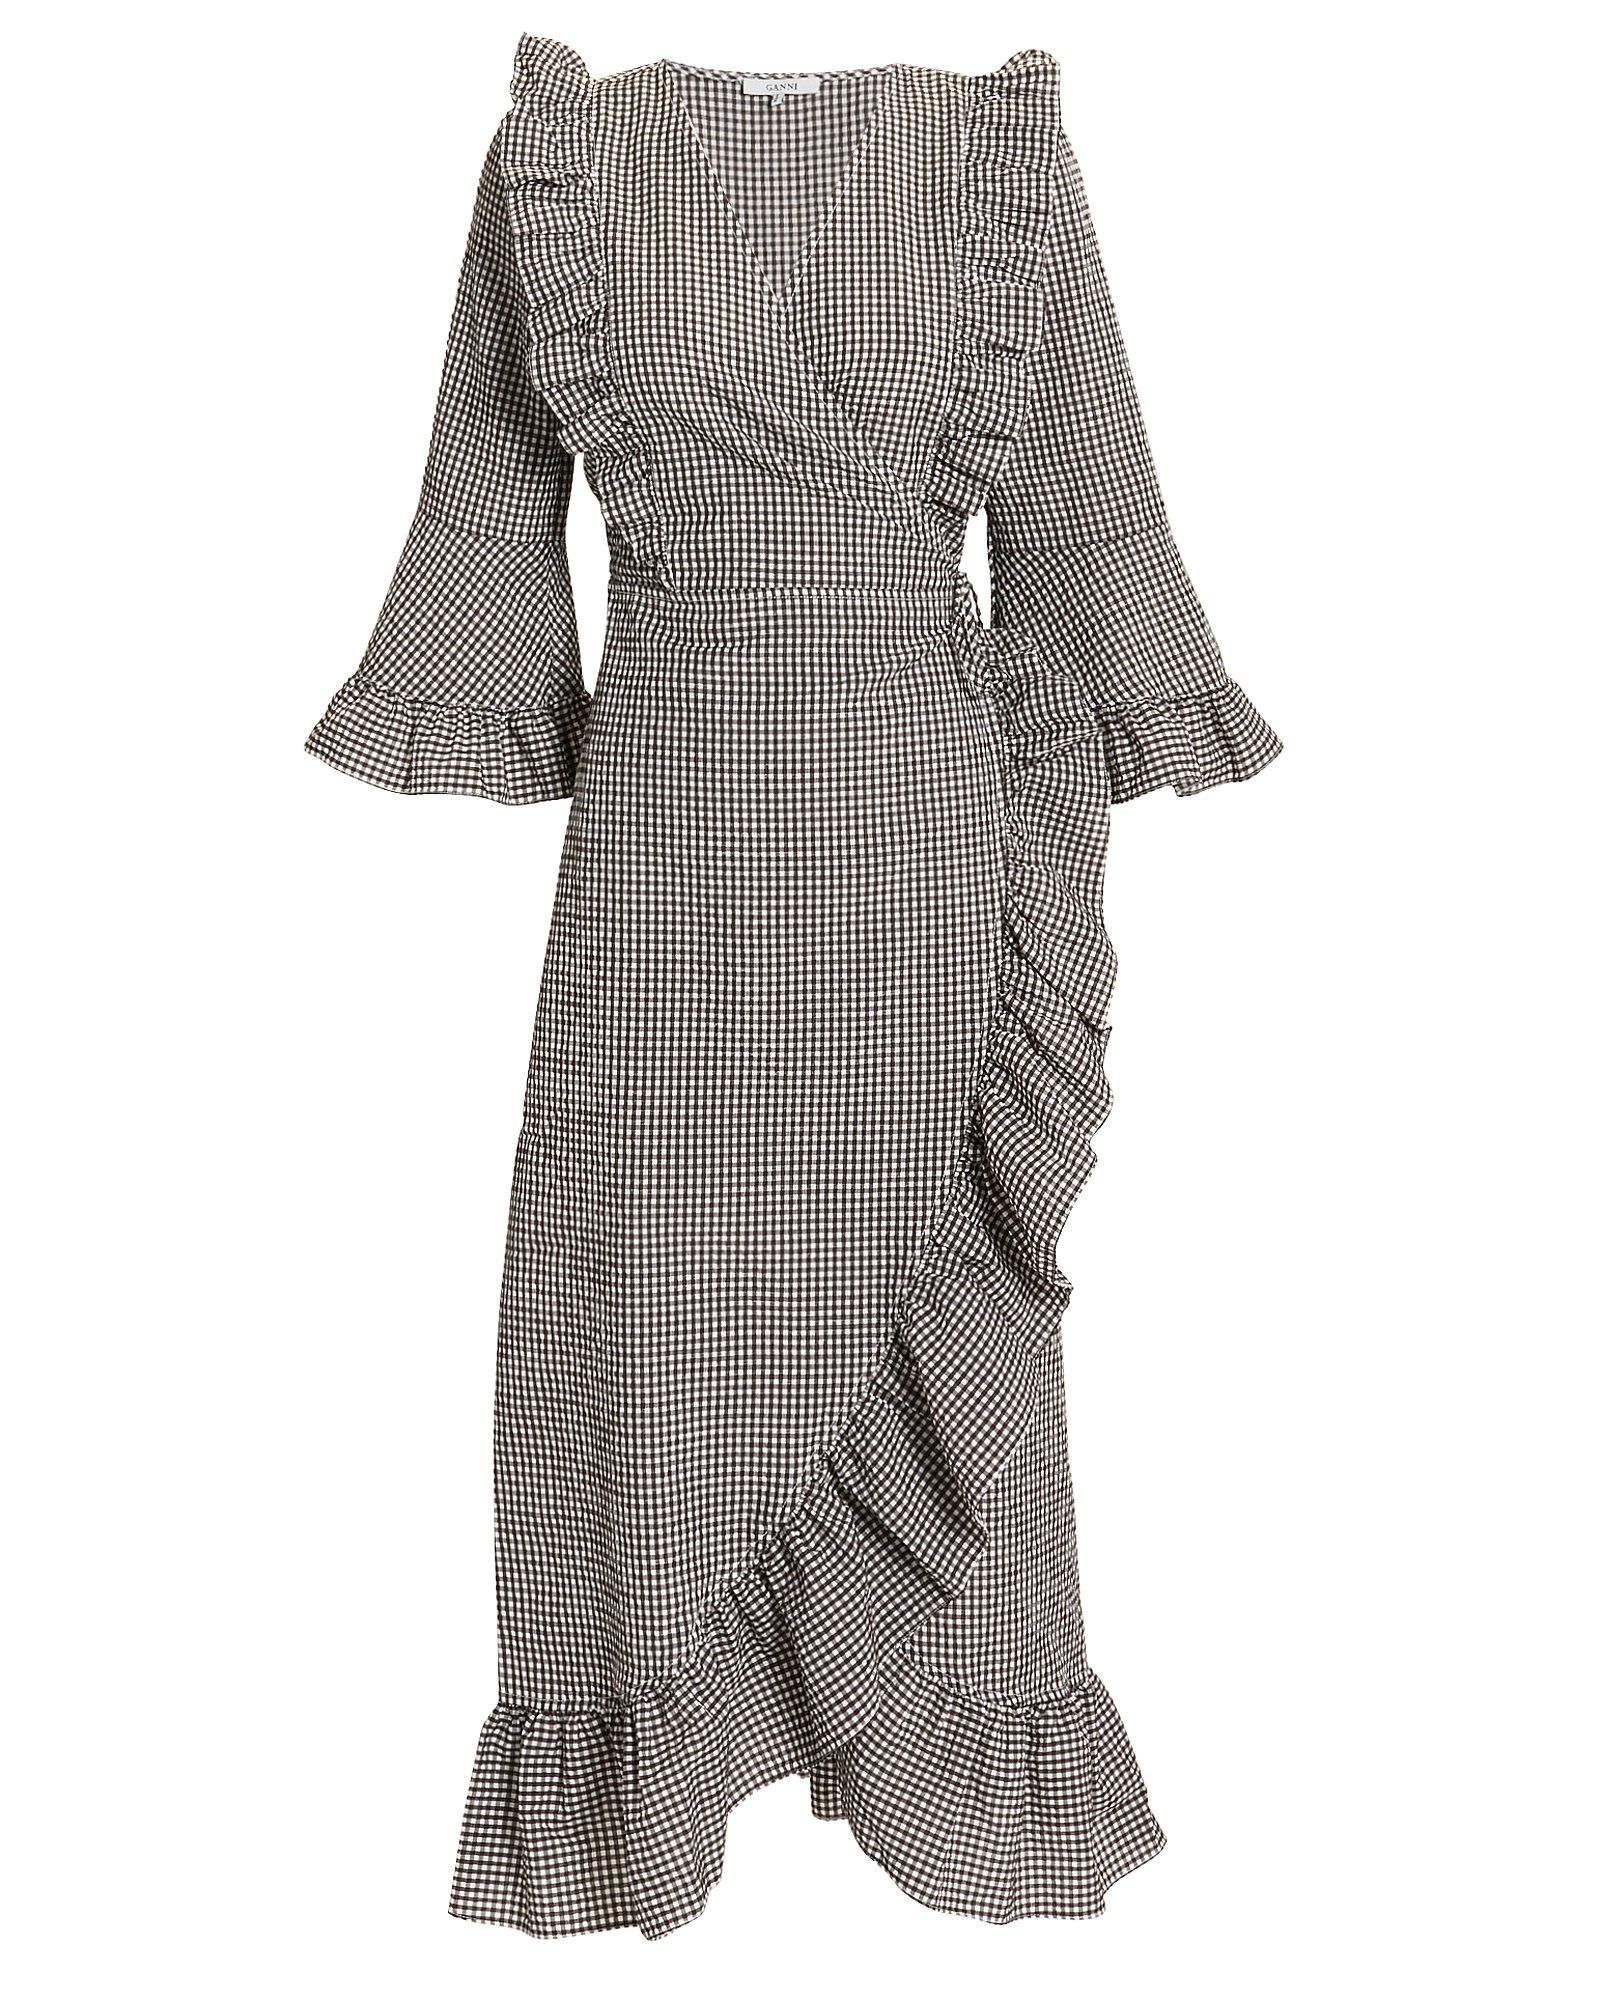 f5c5eab0 Ganni Charron Gingham Cotton-Blend Wrap Dress In Brown | ModeSens